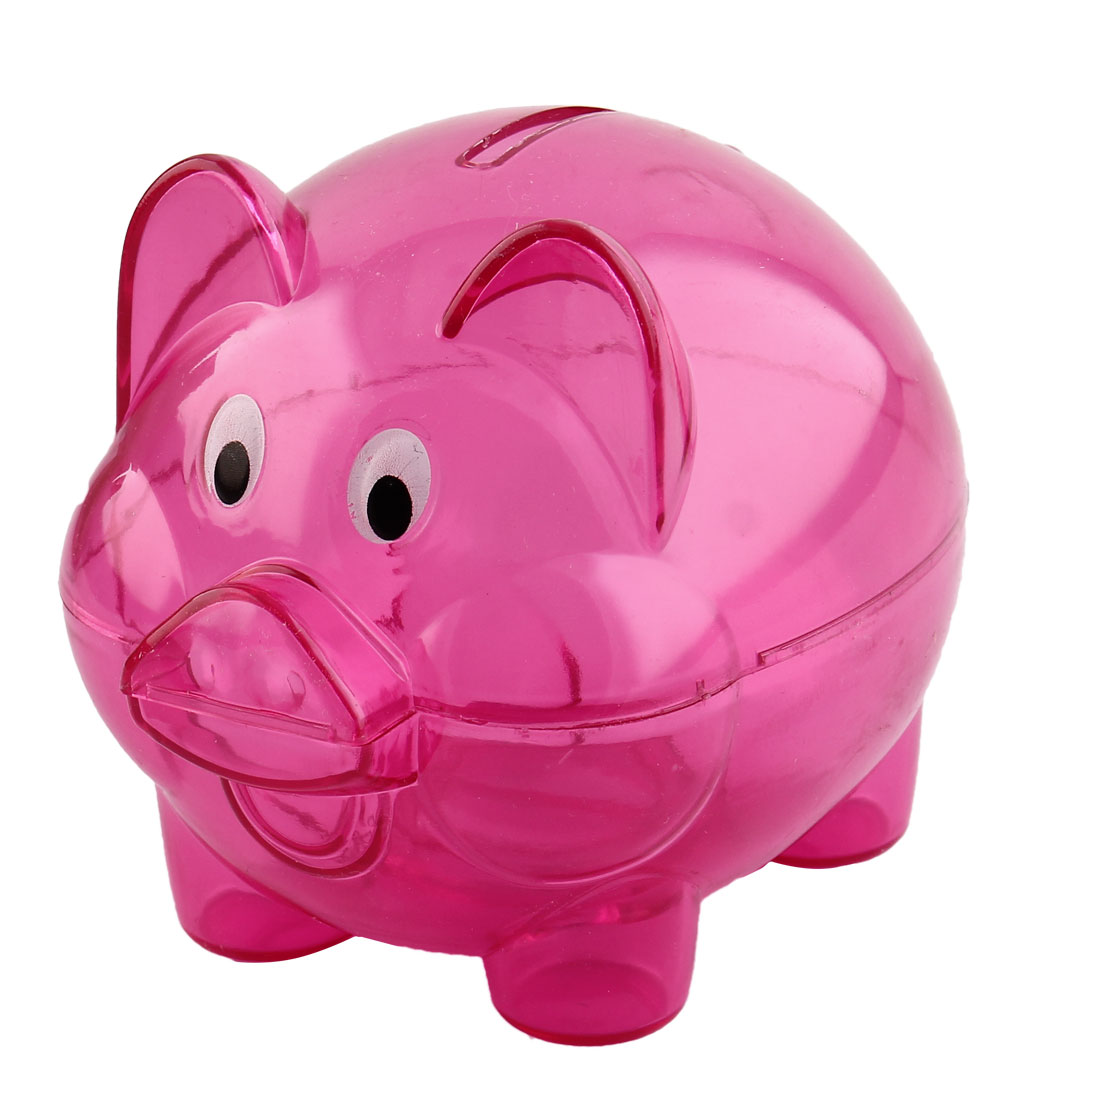 Home Plastic Pig Shape Money Saving Holder Coin Storage Pot Piggy Bank Fuchsia